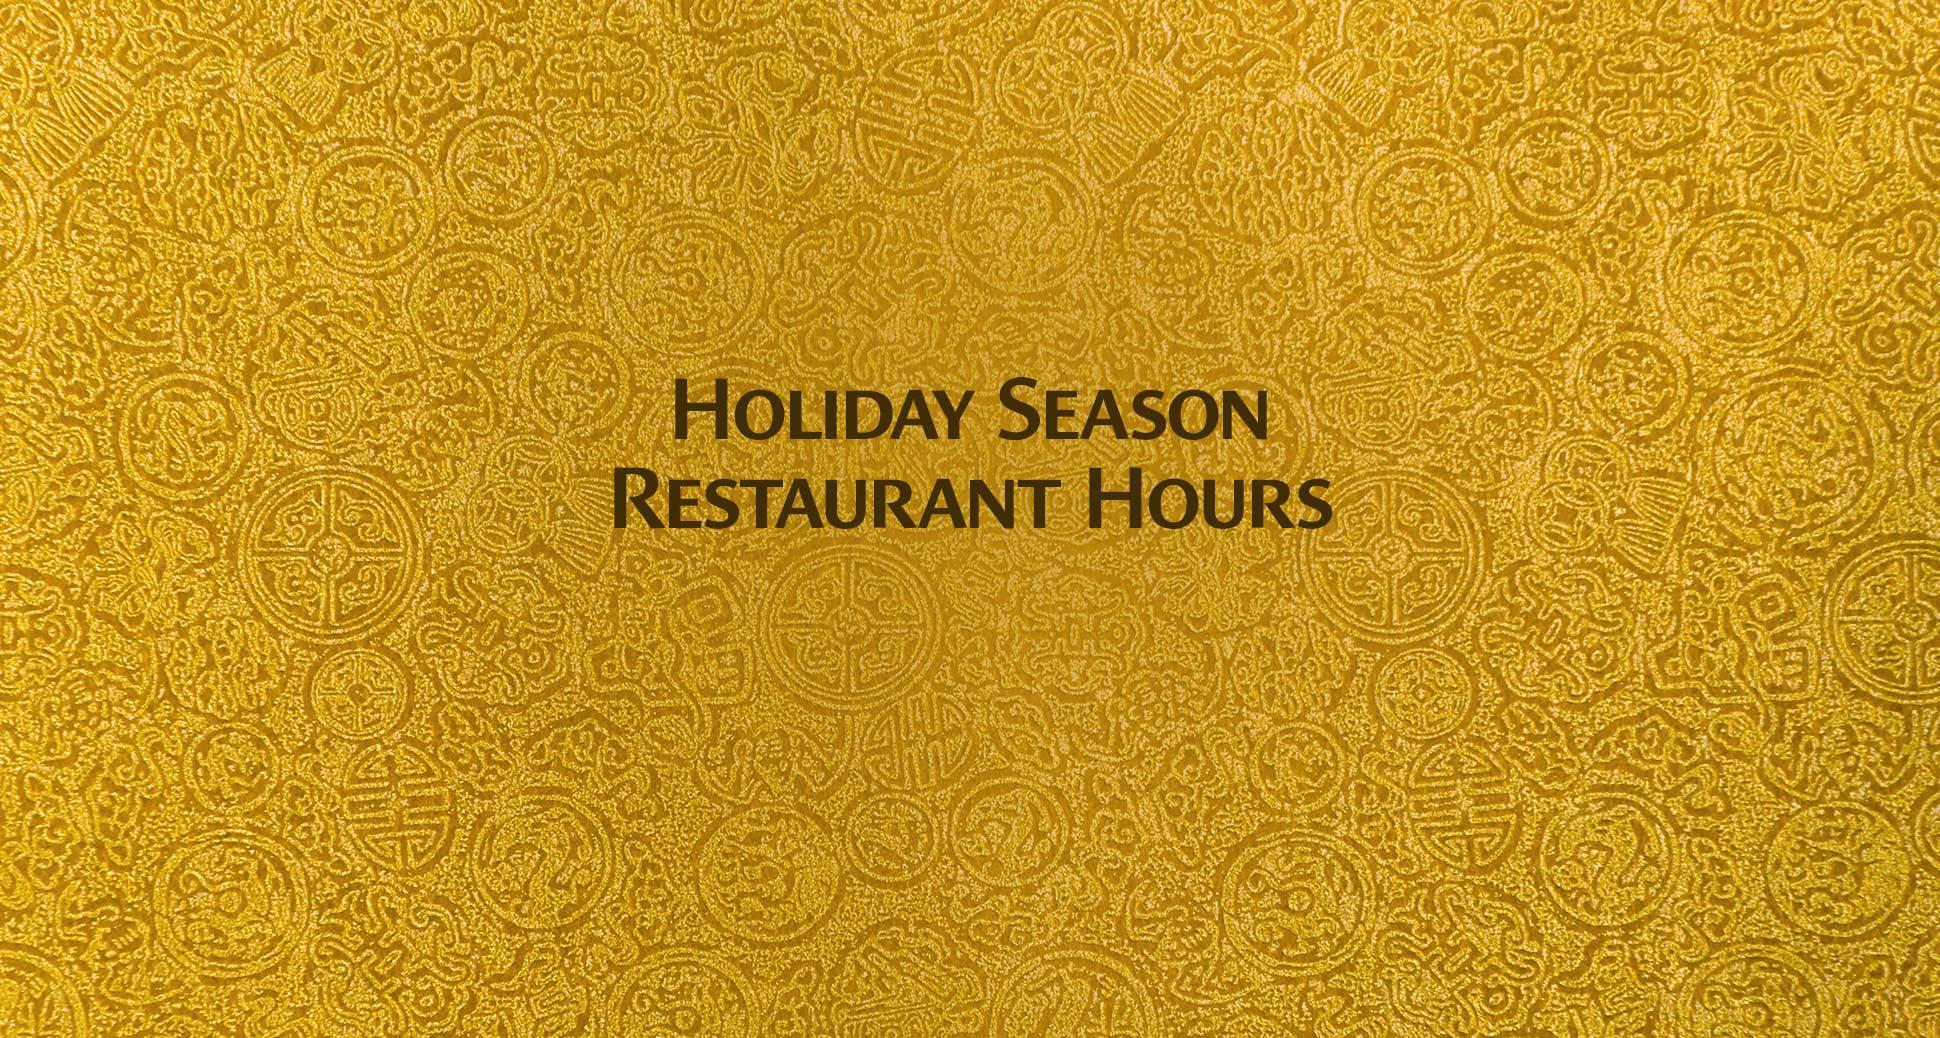 Holiday season restaurant hours